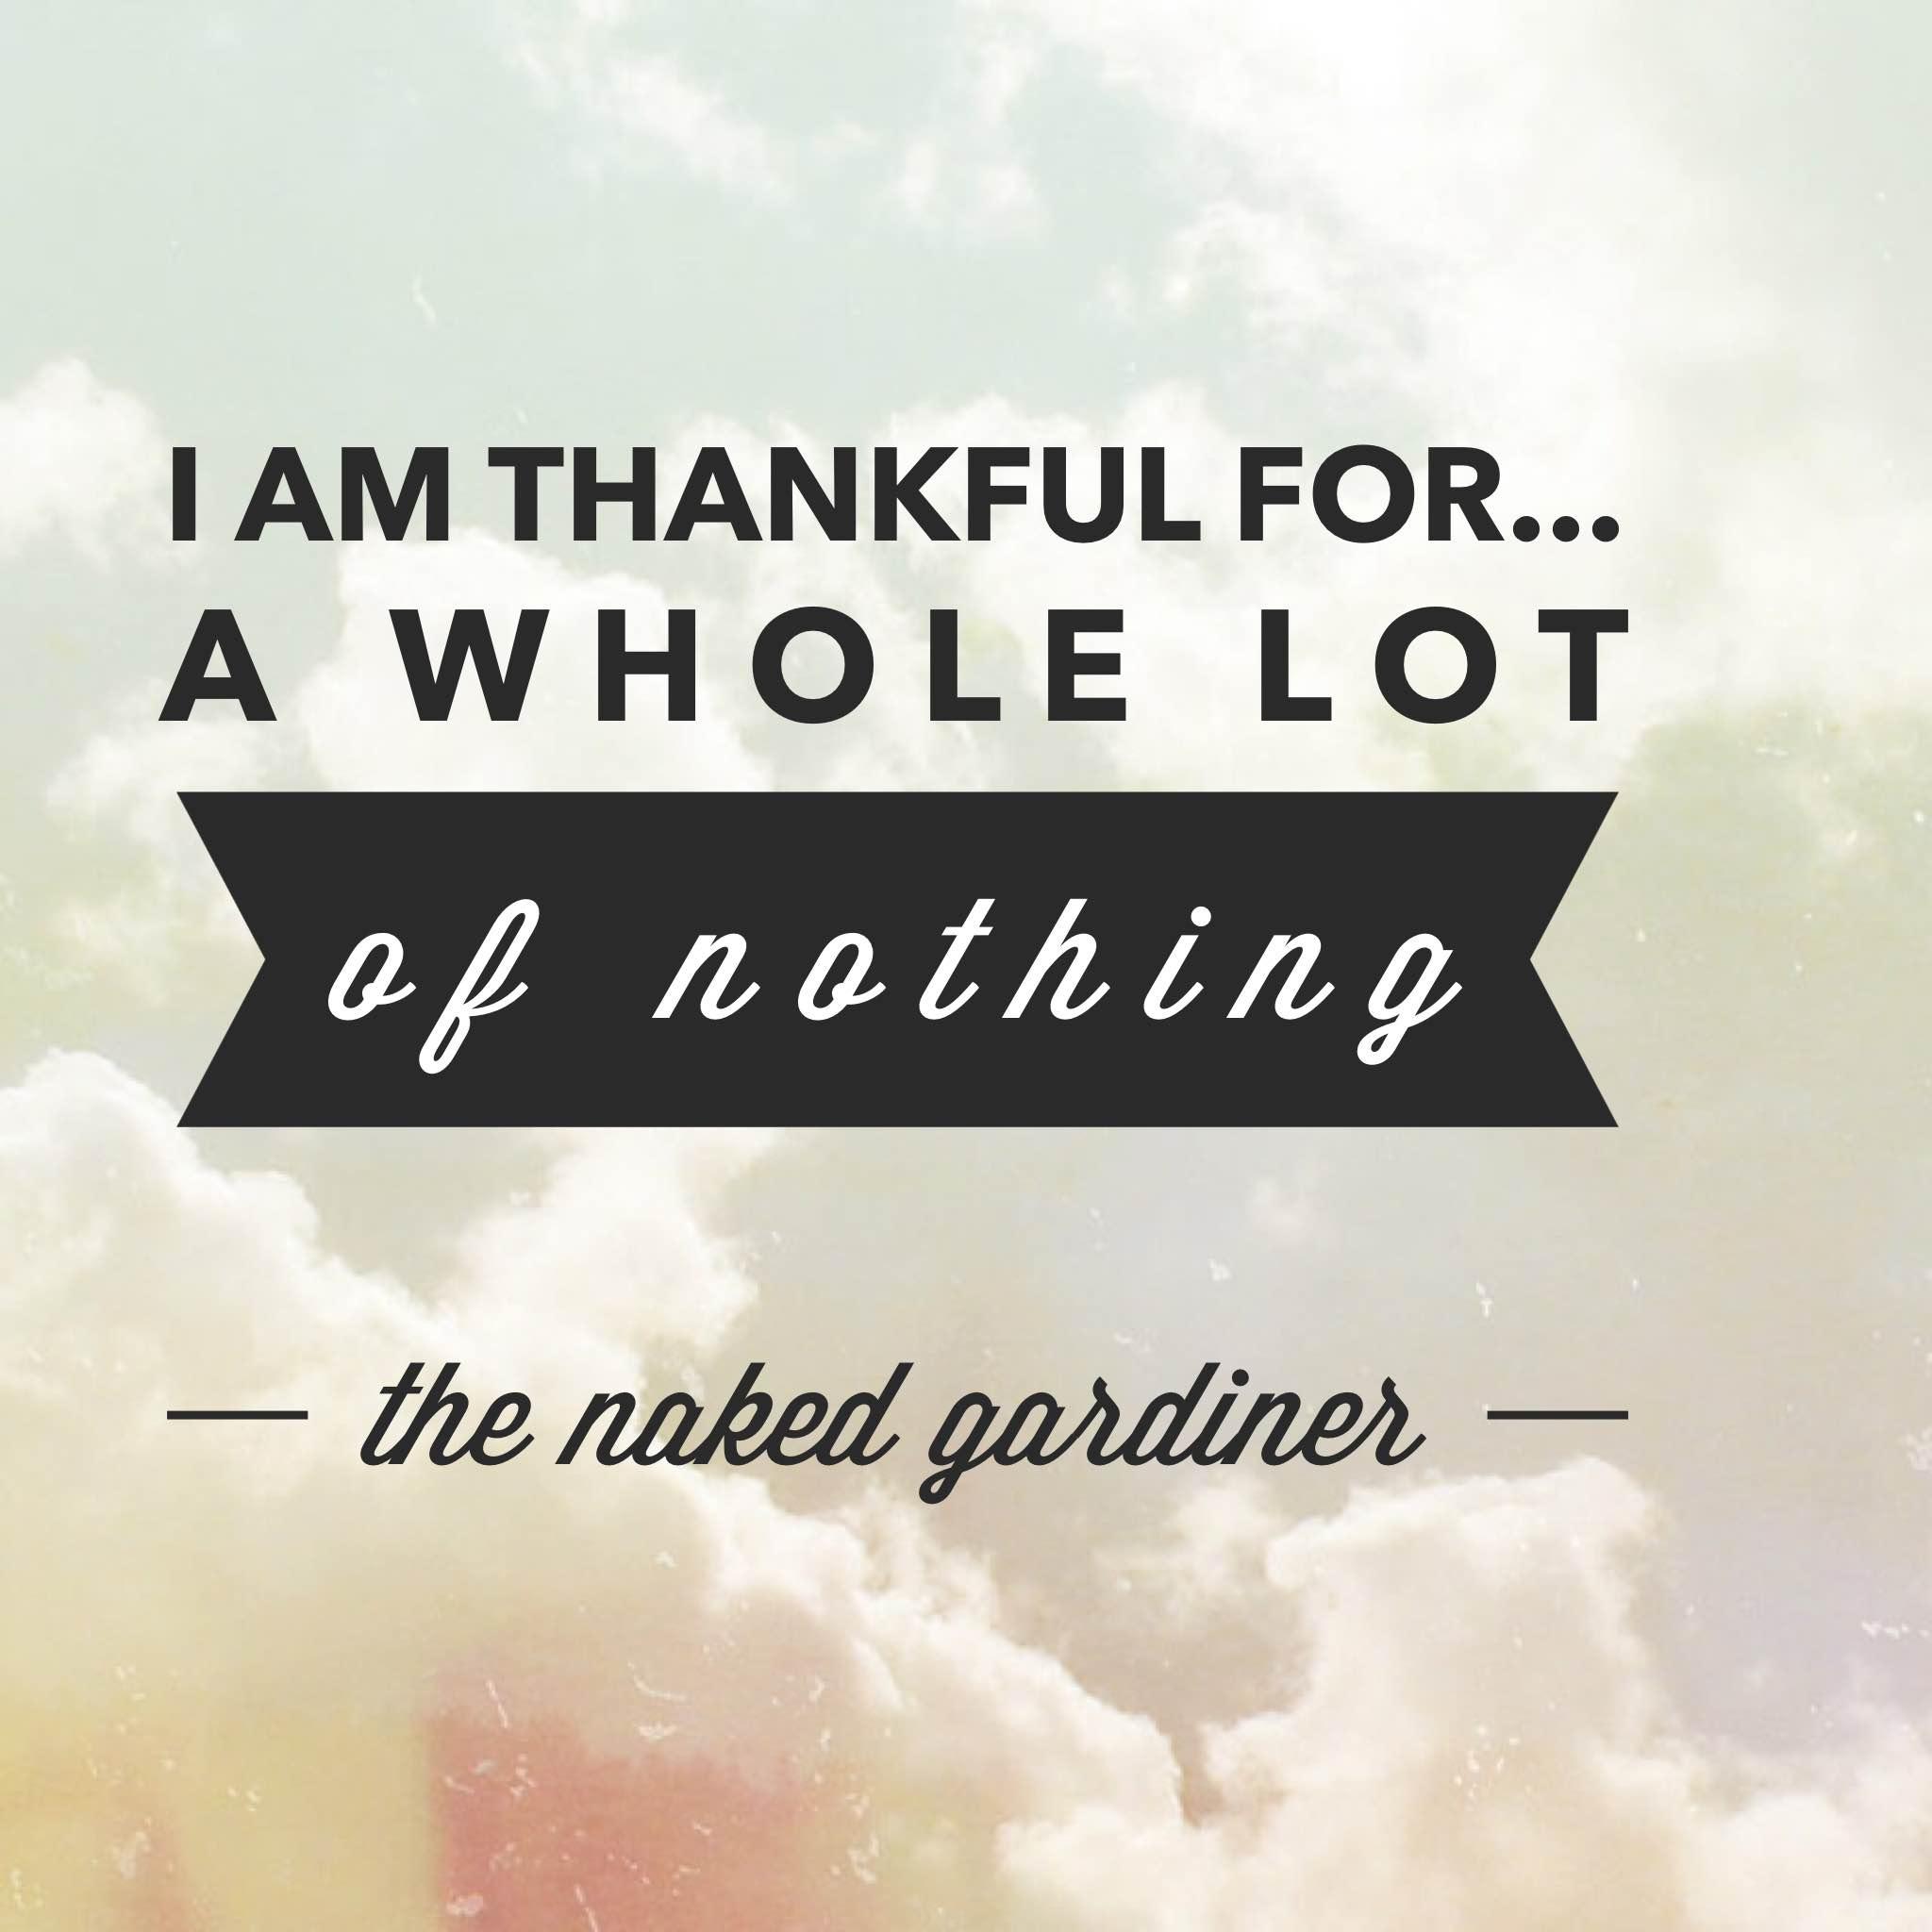 thankful-thursdays-a-whole-lot-of-nothing-thenakedgardiner